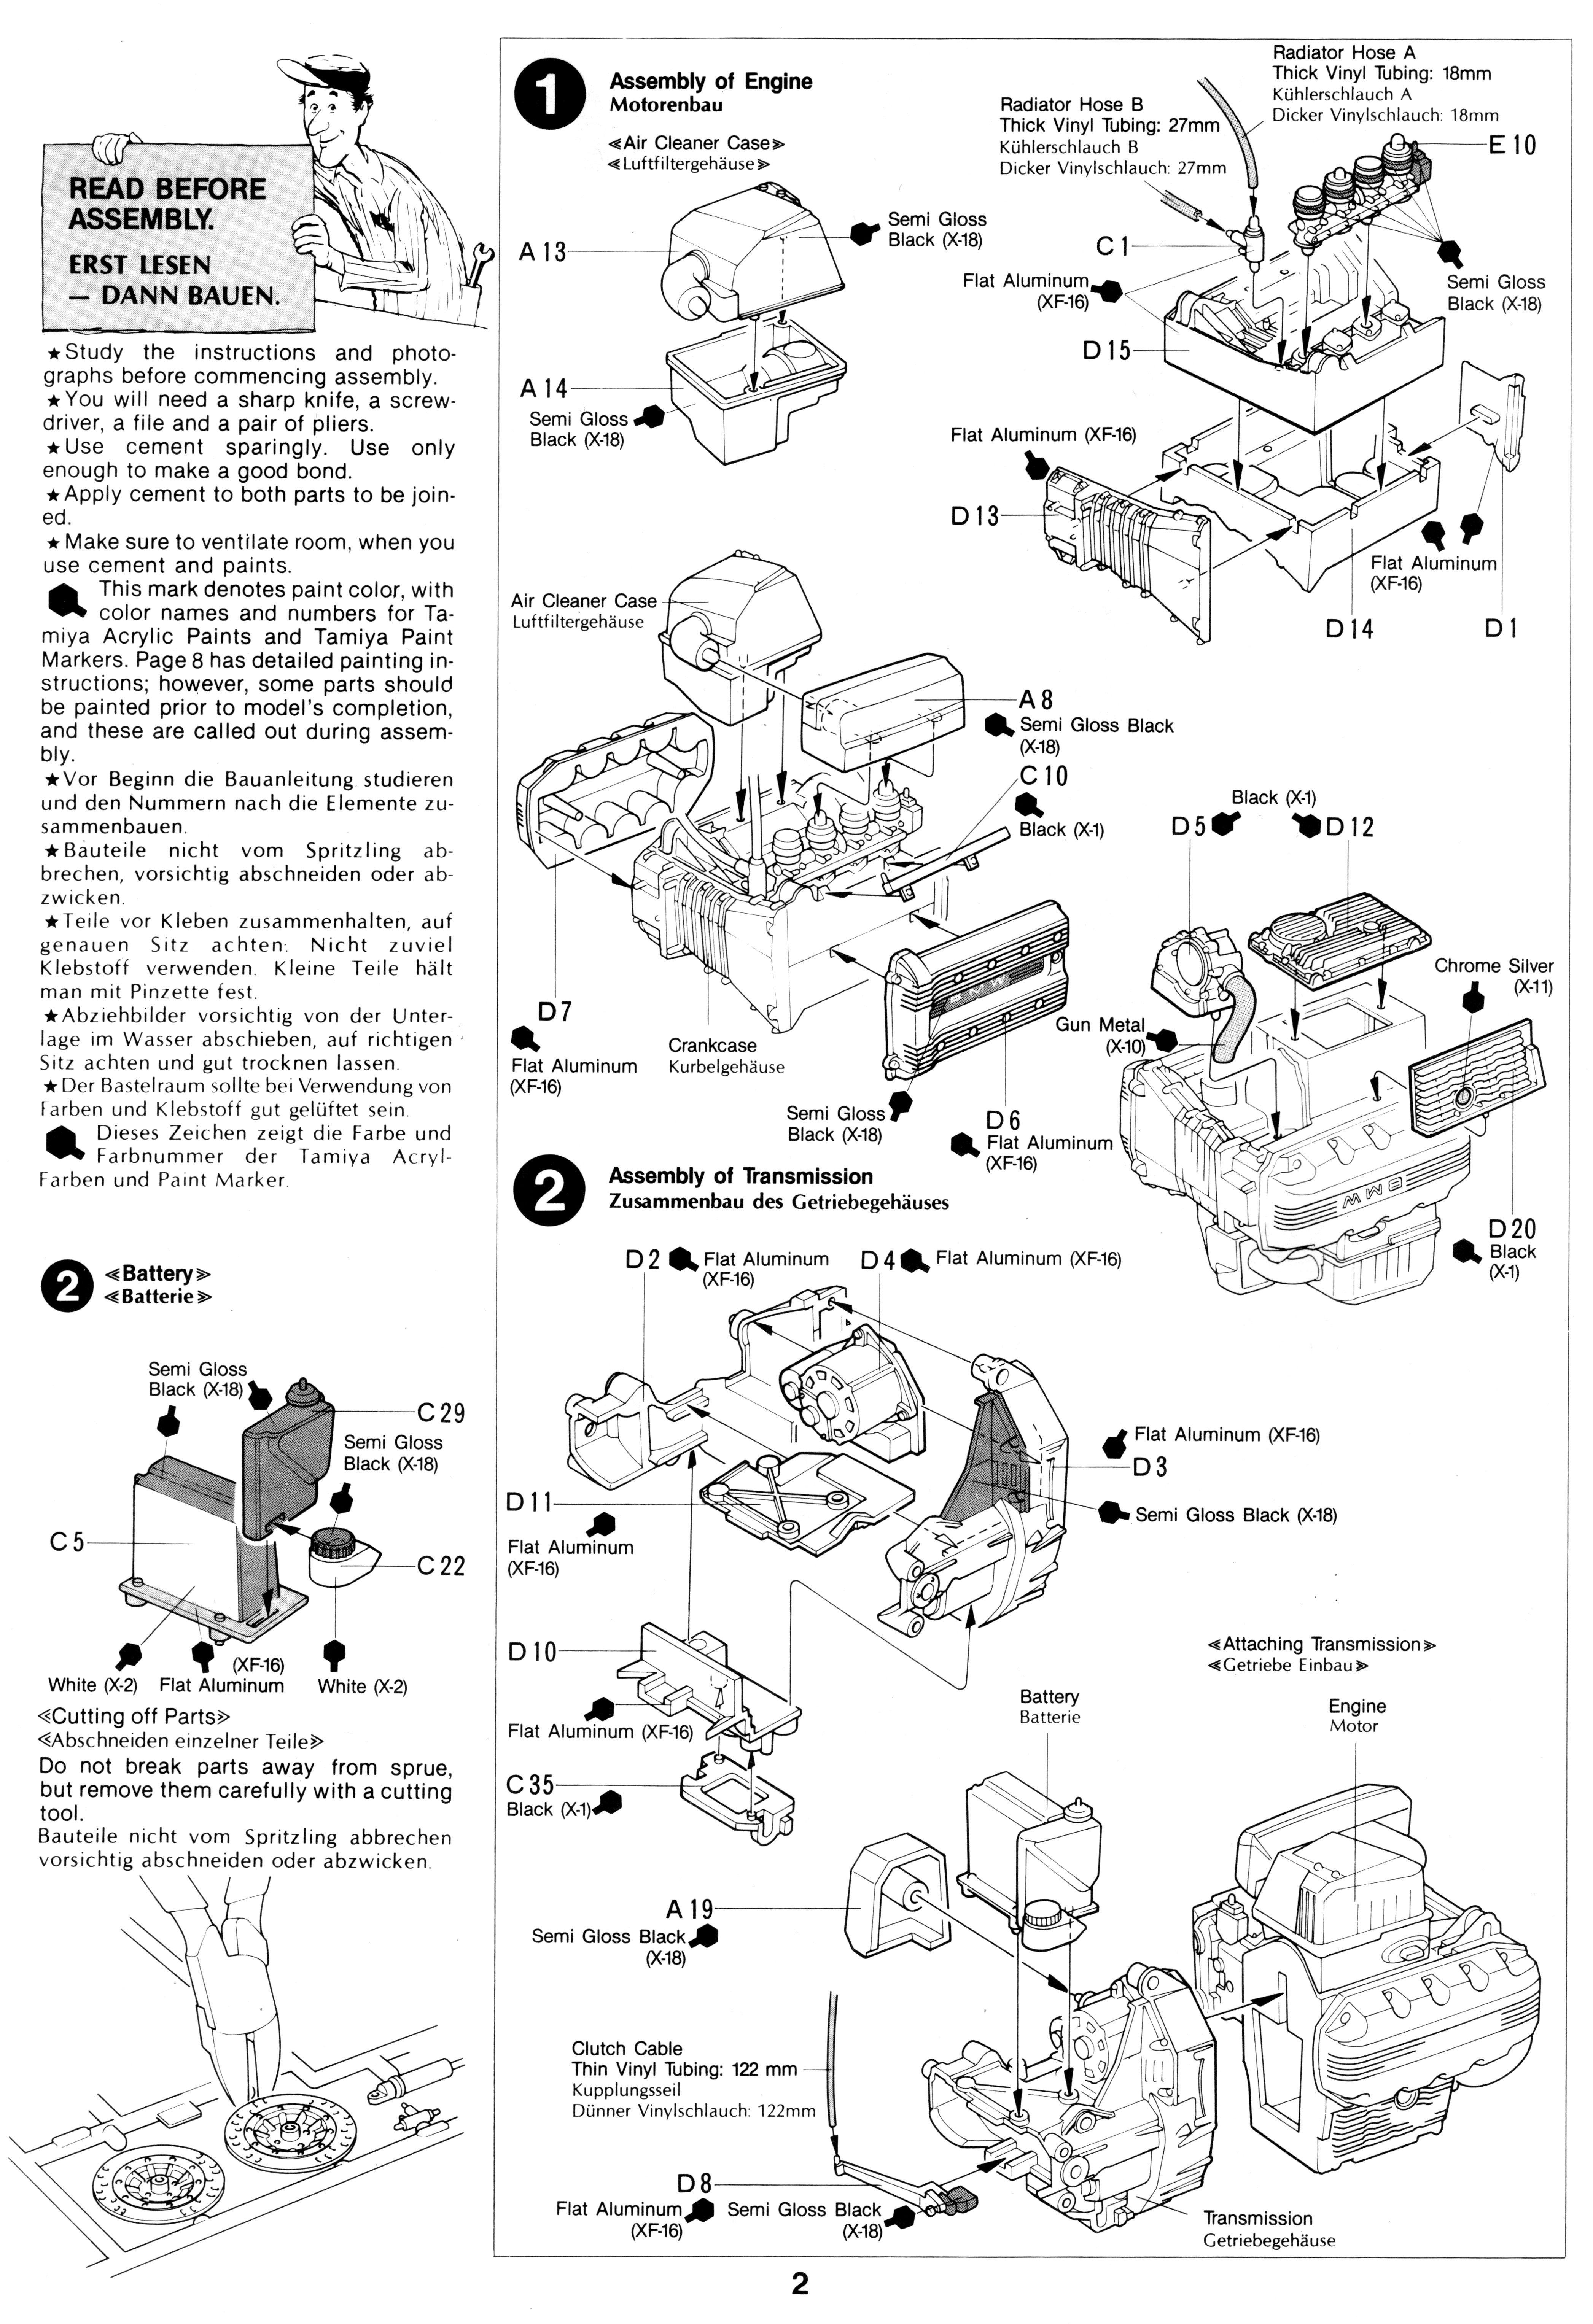 blaupunkt rd4 wiring diagram 3 speed ceiling fan motor wrg 6786 peugeot auto